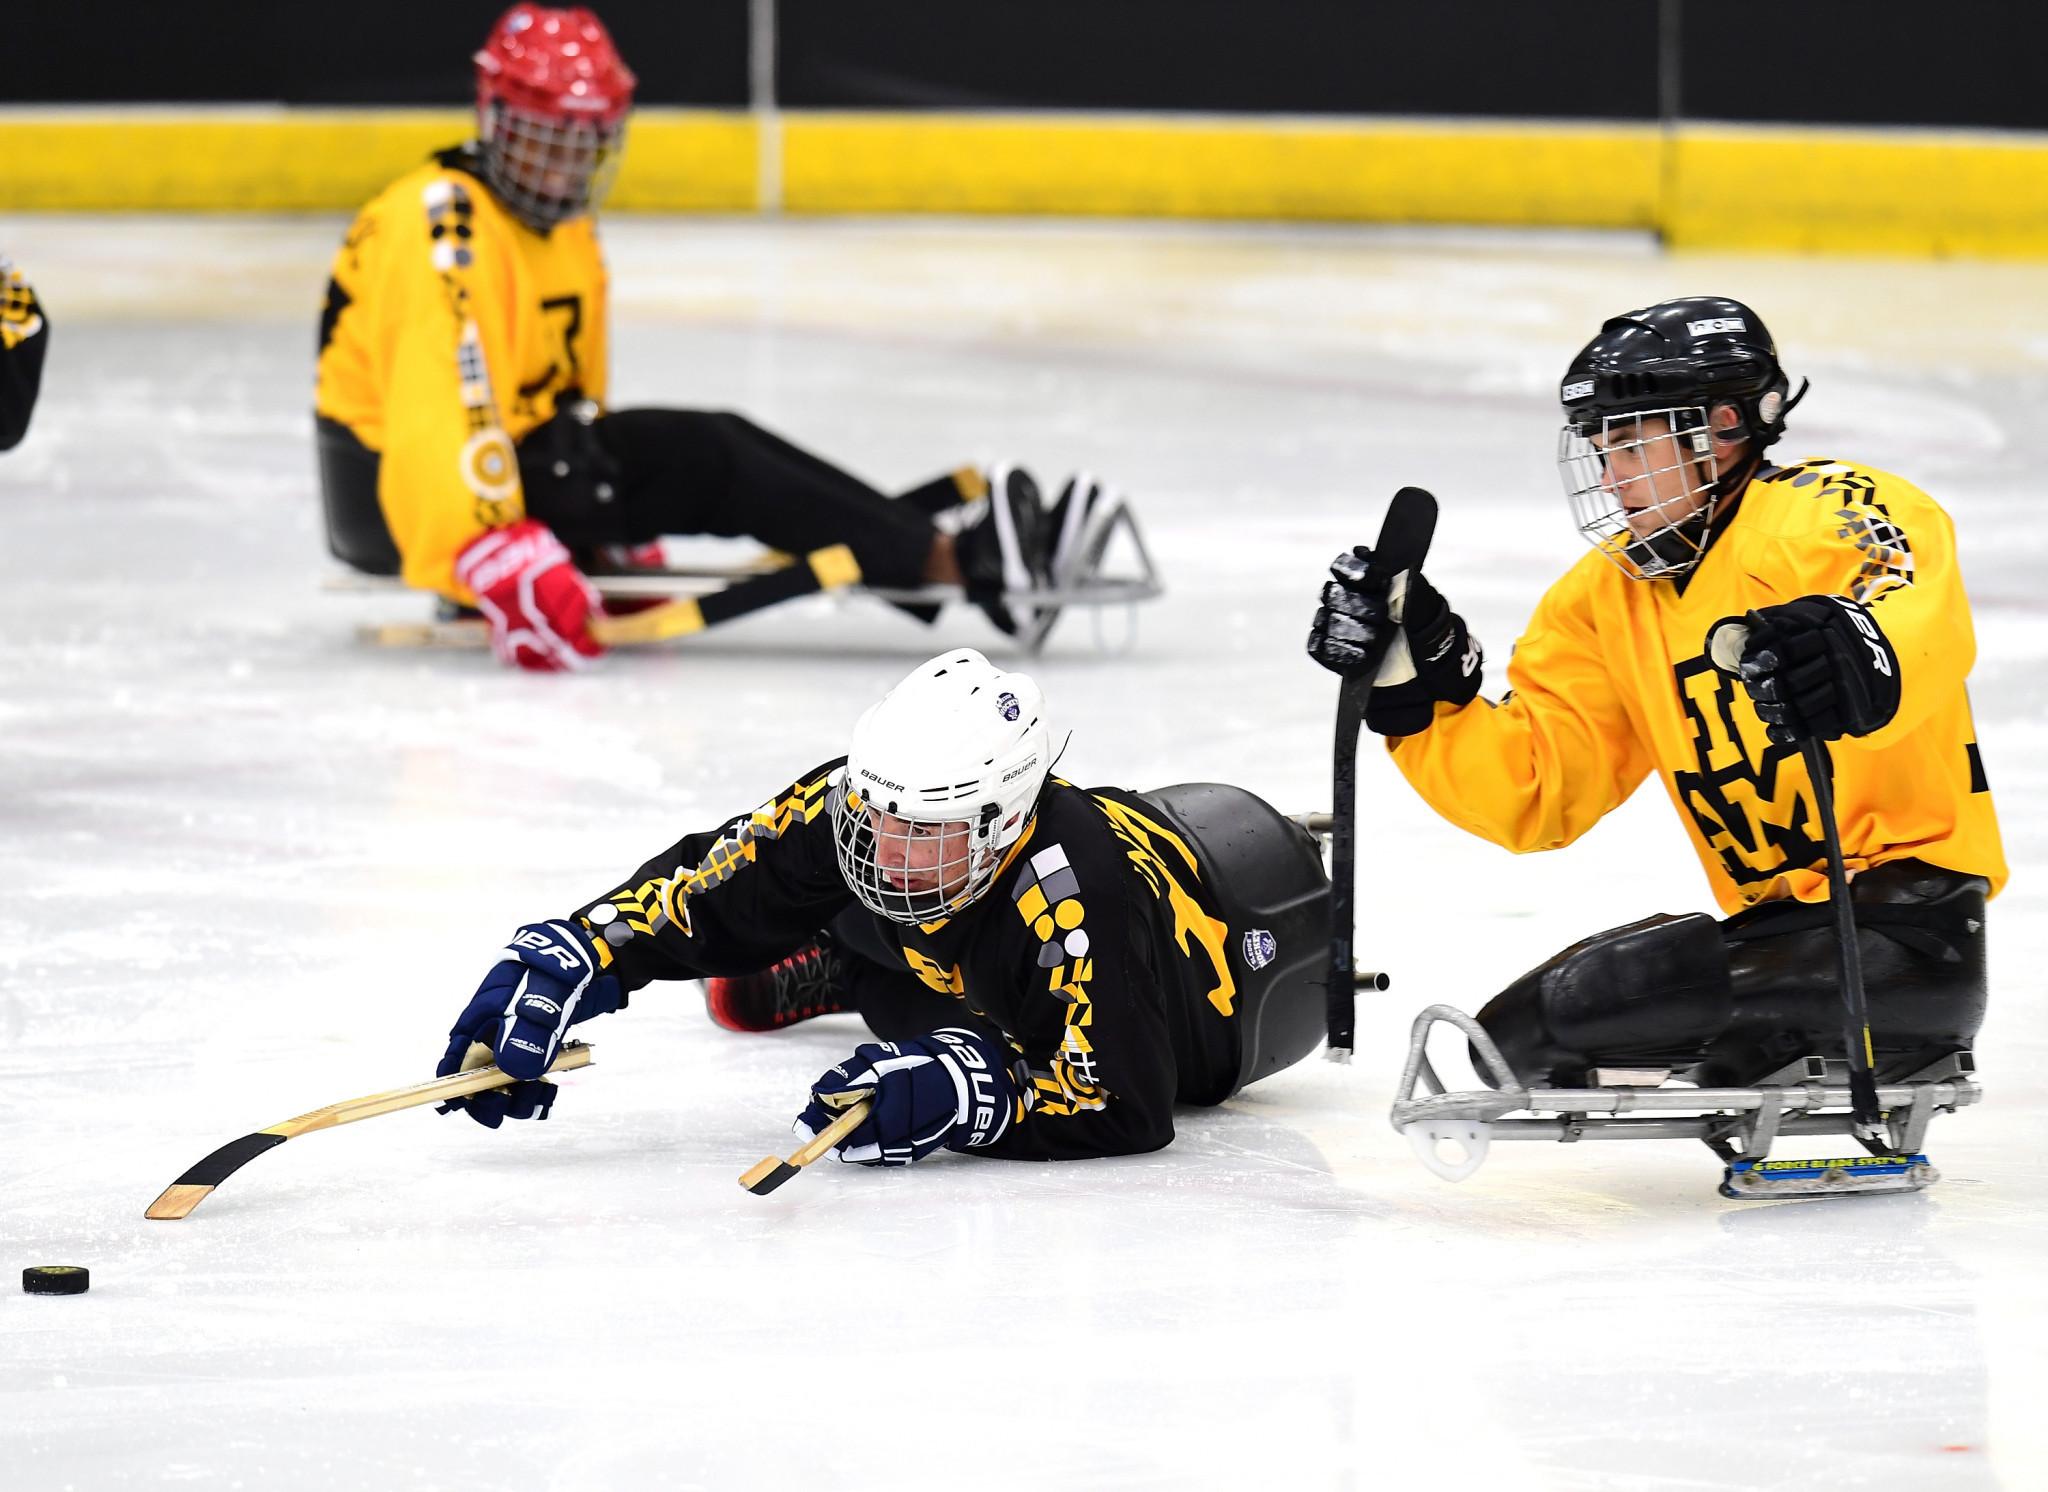 World Para Ice Hockey seeking host for Beijing 2022 qualifying tournament